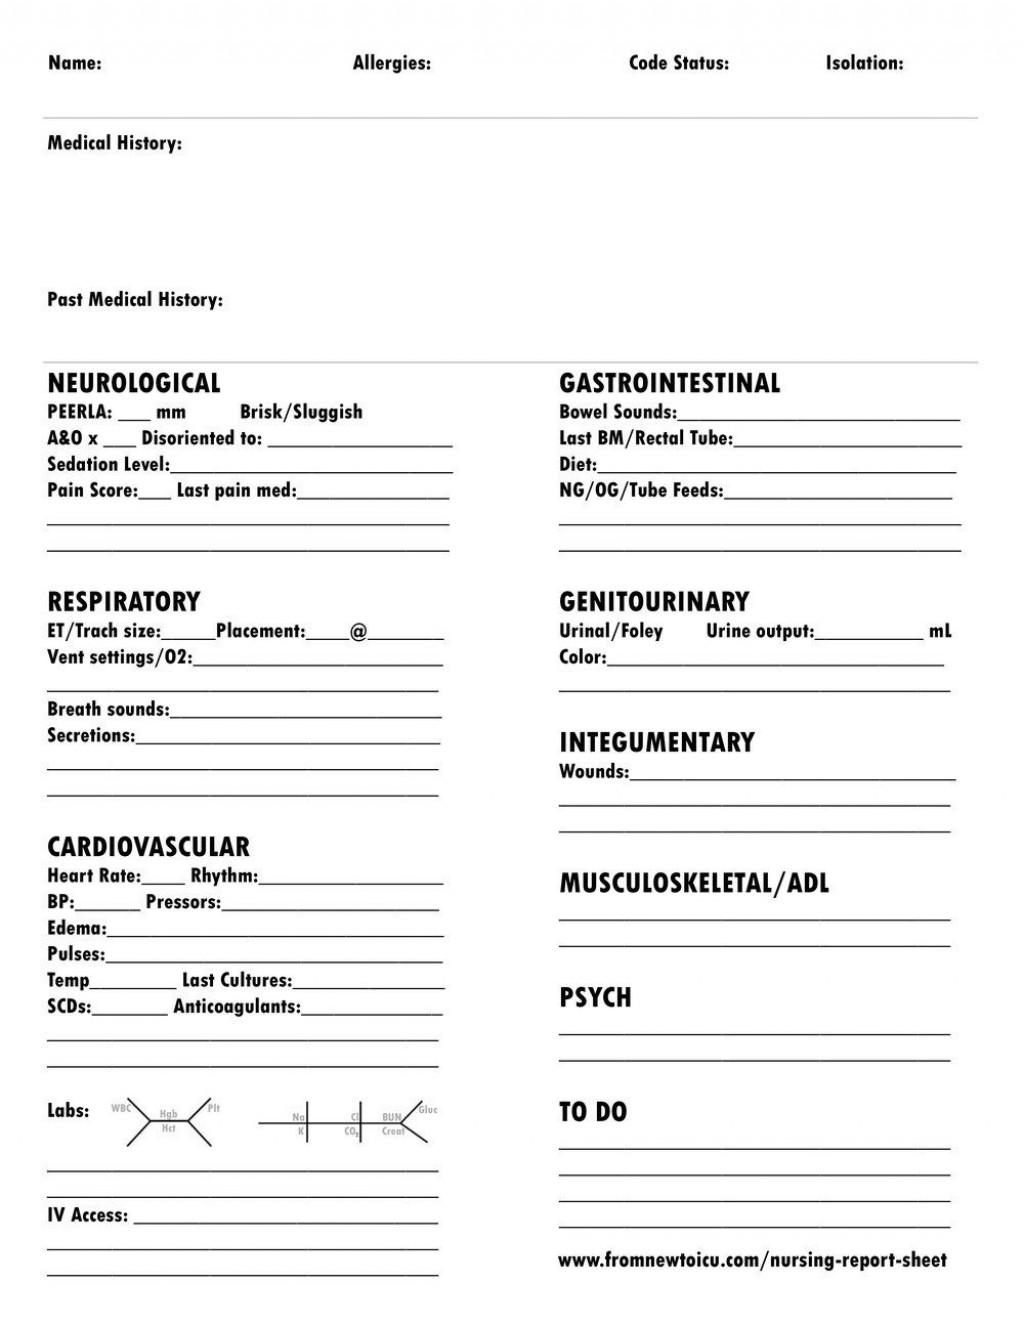 005 Archaicawful Nursing Report Sheet Template Sample  Icu Rn PrintableLarge